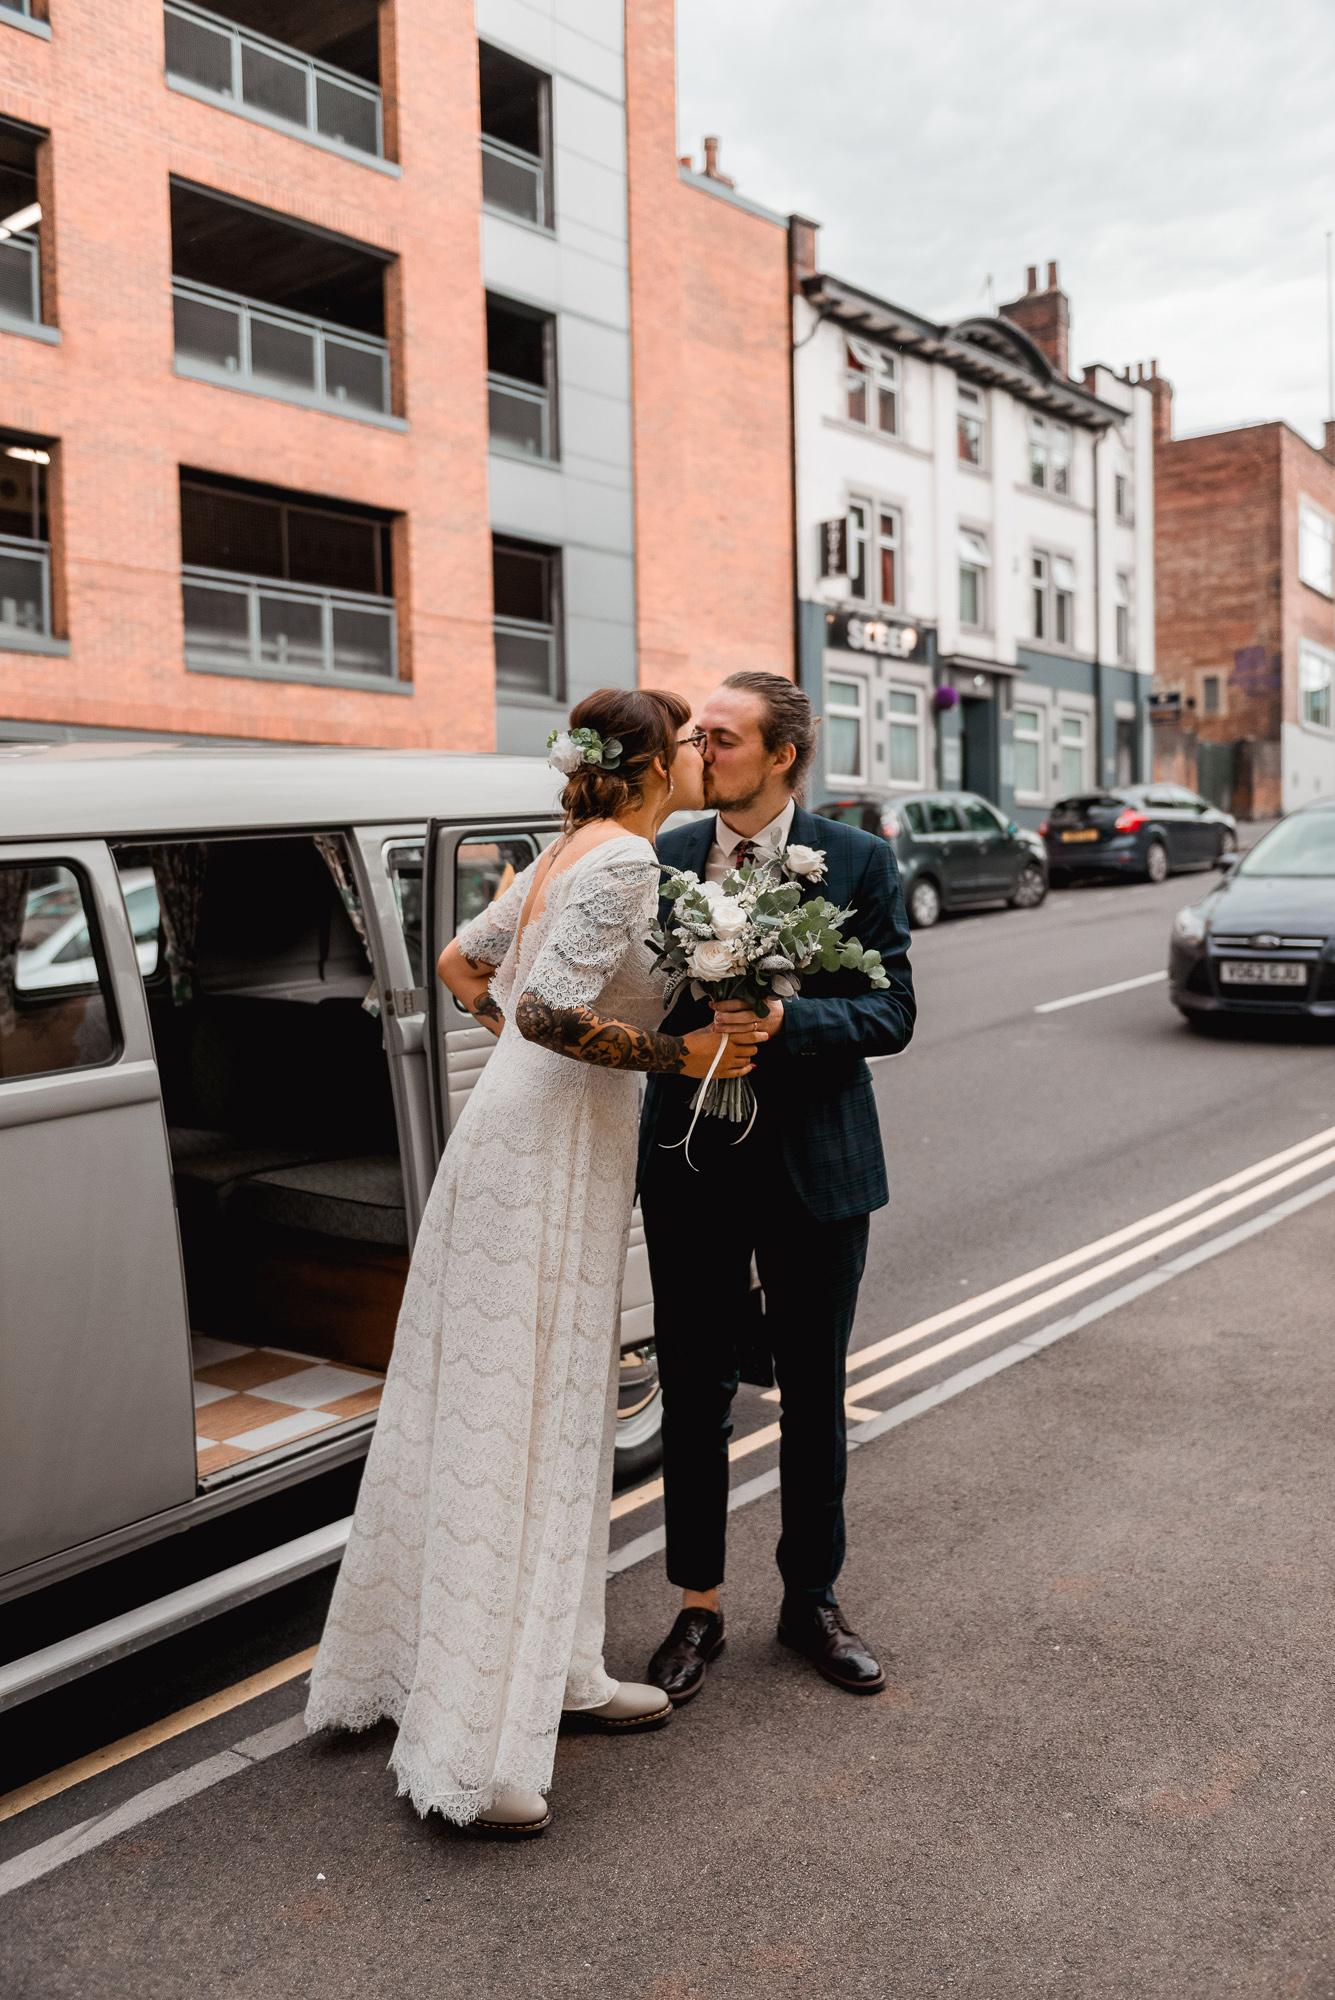 Harriet-Dahlia-Bespoke-Lace-Silk-Bohemian-Wedding-Dress-Sleeves-Tattooed-Bride-Alternative-Wedding-Sheffield-23.jpg